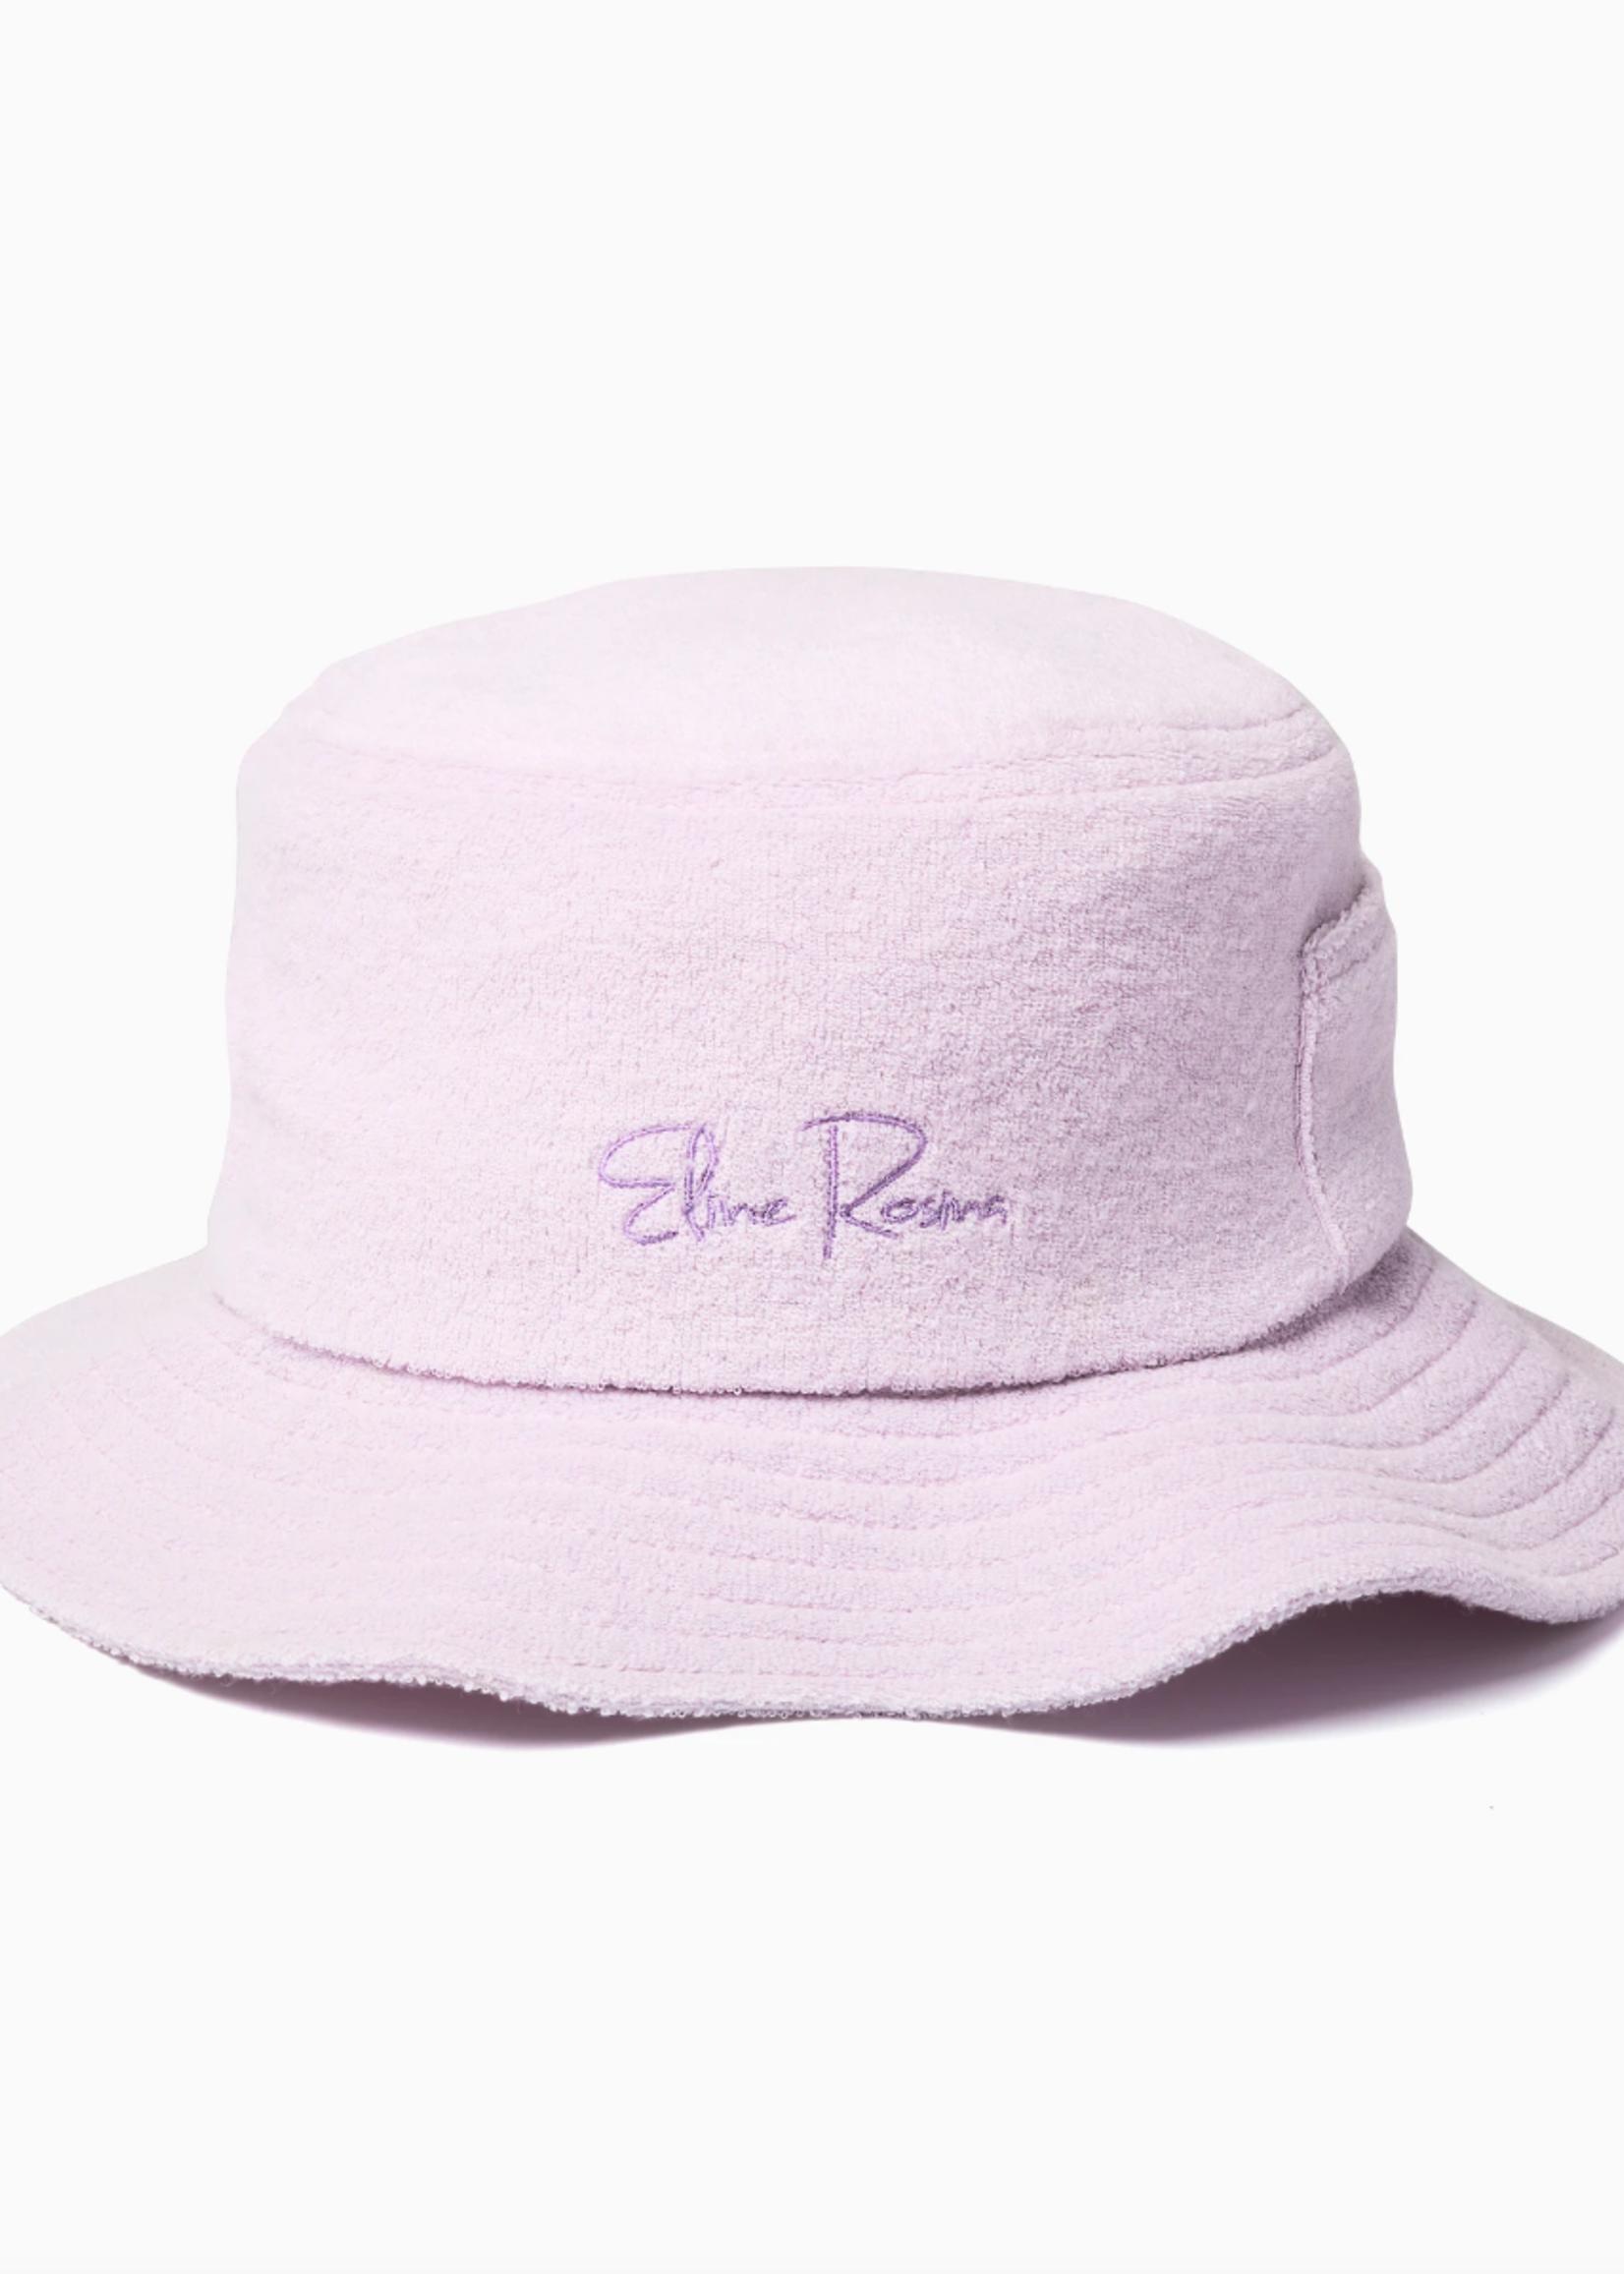 Eline Rosina Terry bucket hat lavender